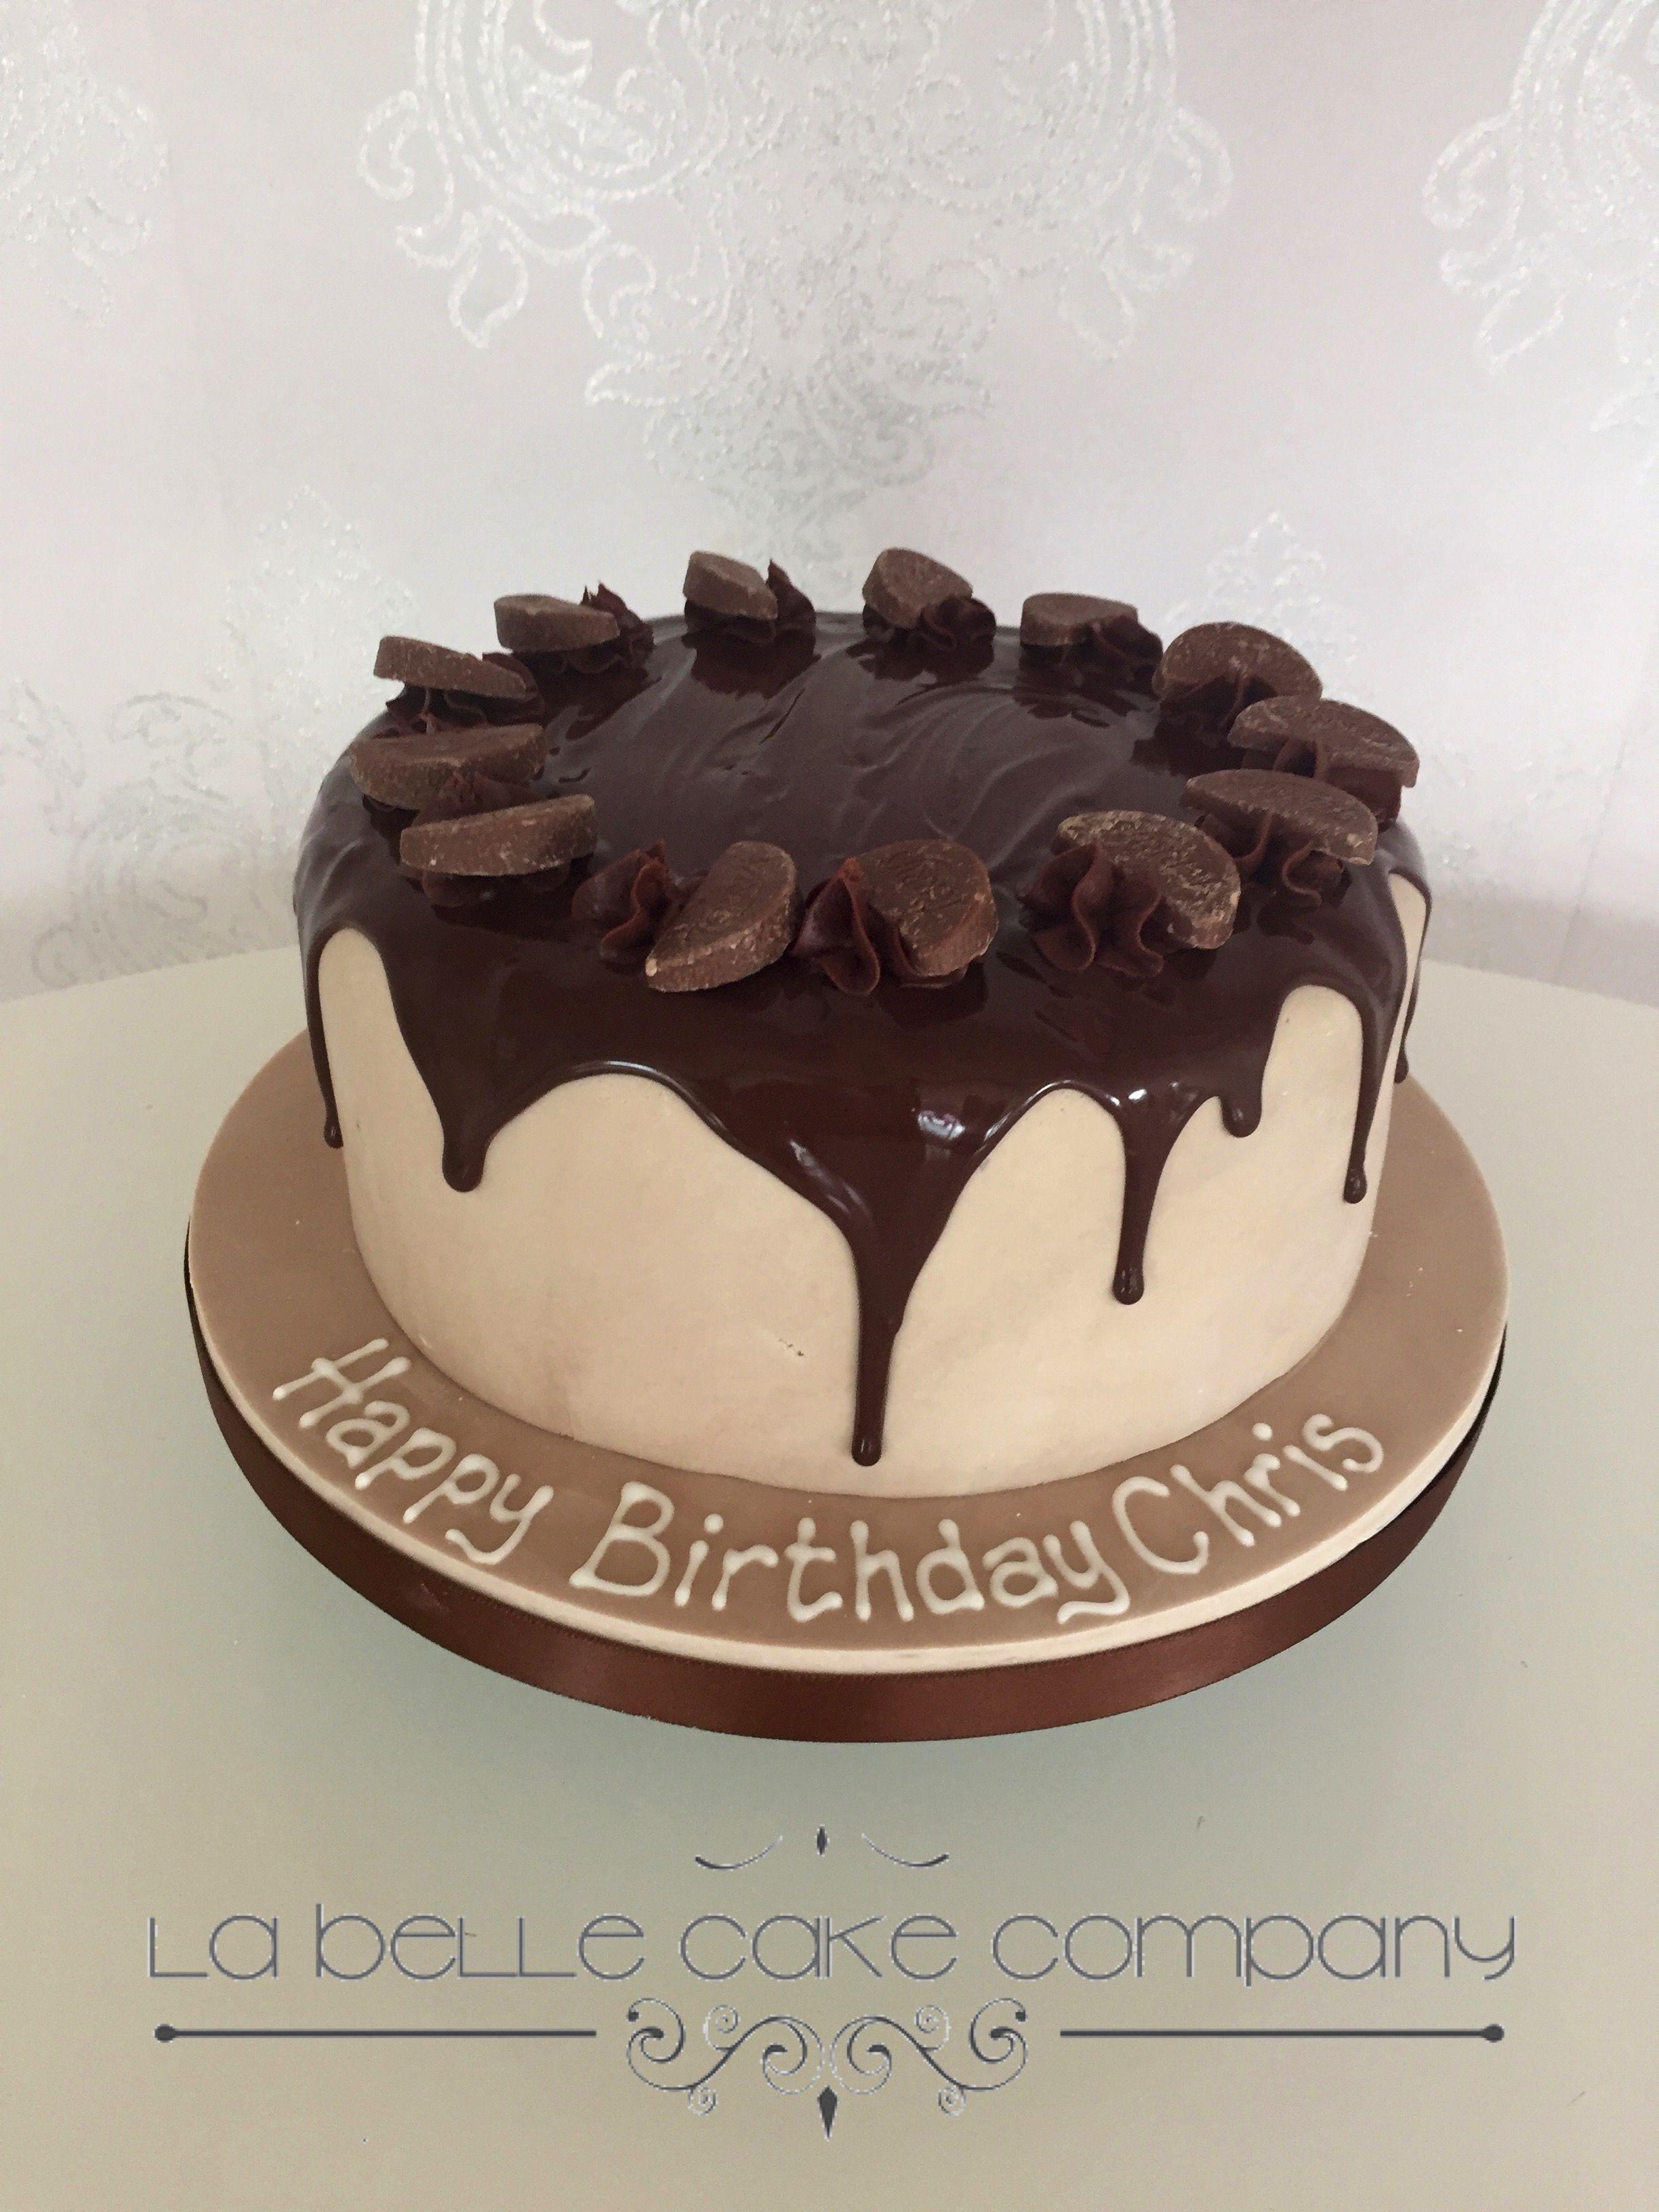 Fine Male Birthday Cakes Bedfordshire Hertfordshire Buckinghamshire Funny Birthday Cards Online Fluifree Goldxyz